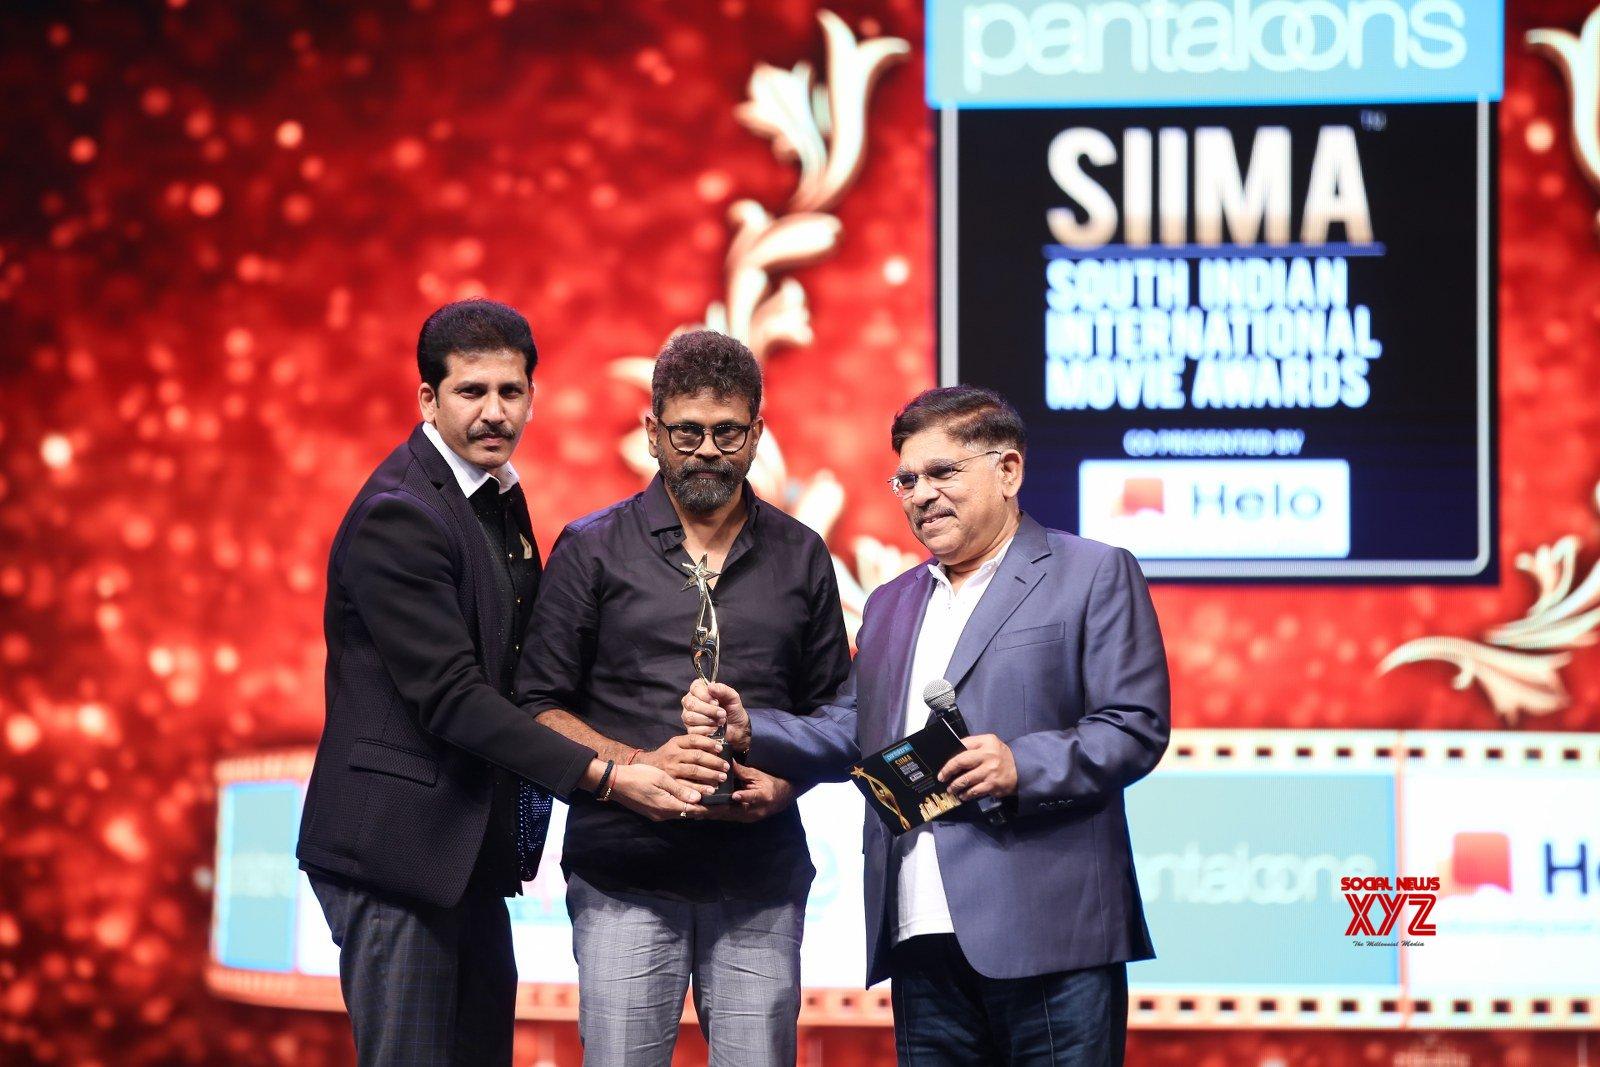 SIIMA Awards 2019 Event In Doha Qatar Gallery Set 10